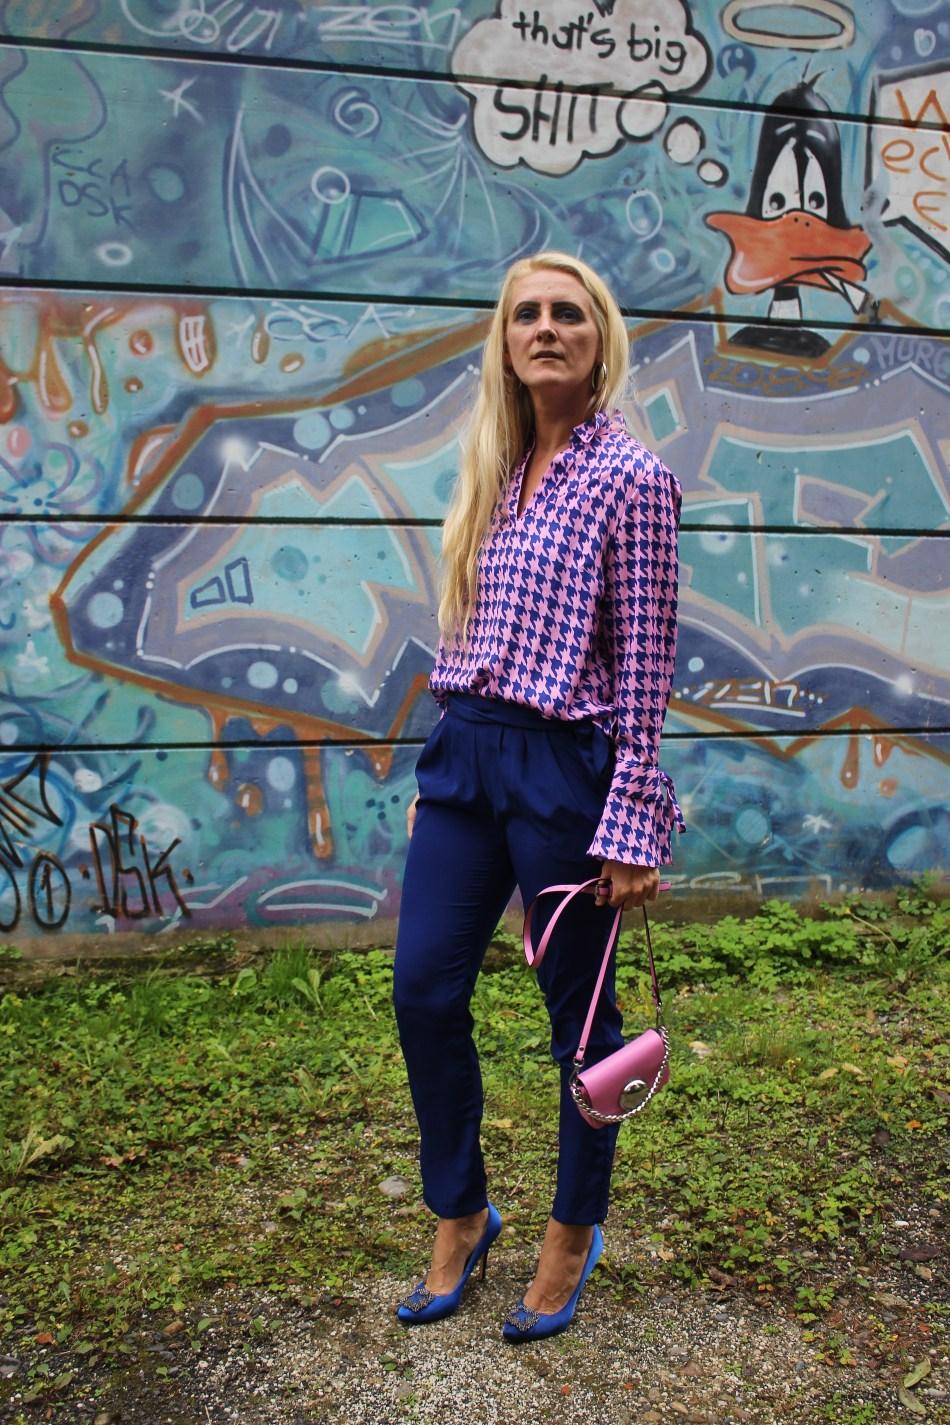 Hahnentritt-Colourblock-Albamoda-Manolo-Blahnik-Heels-carrieslifestyle-Tamara-Prutsch